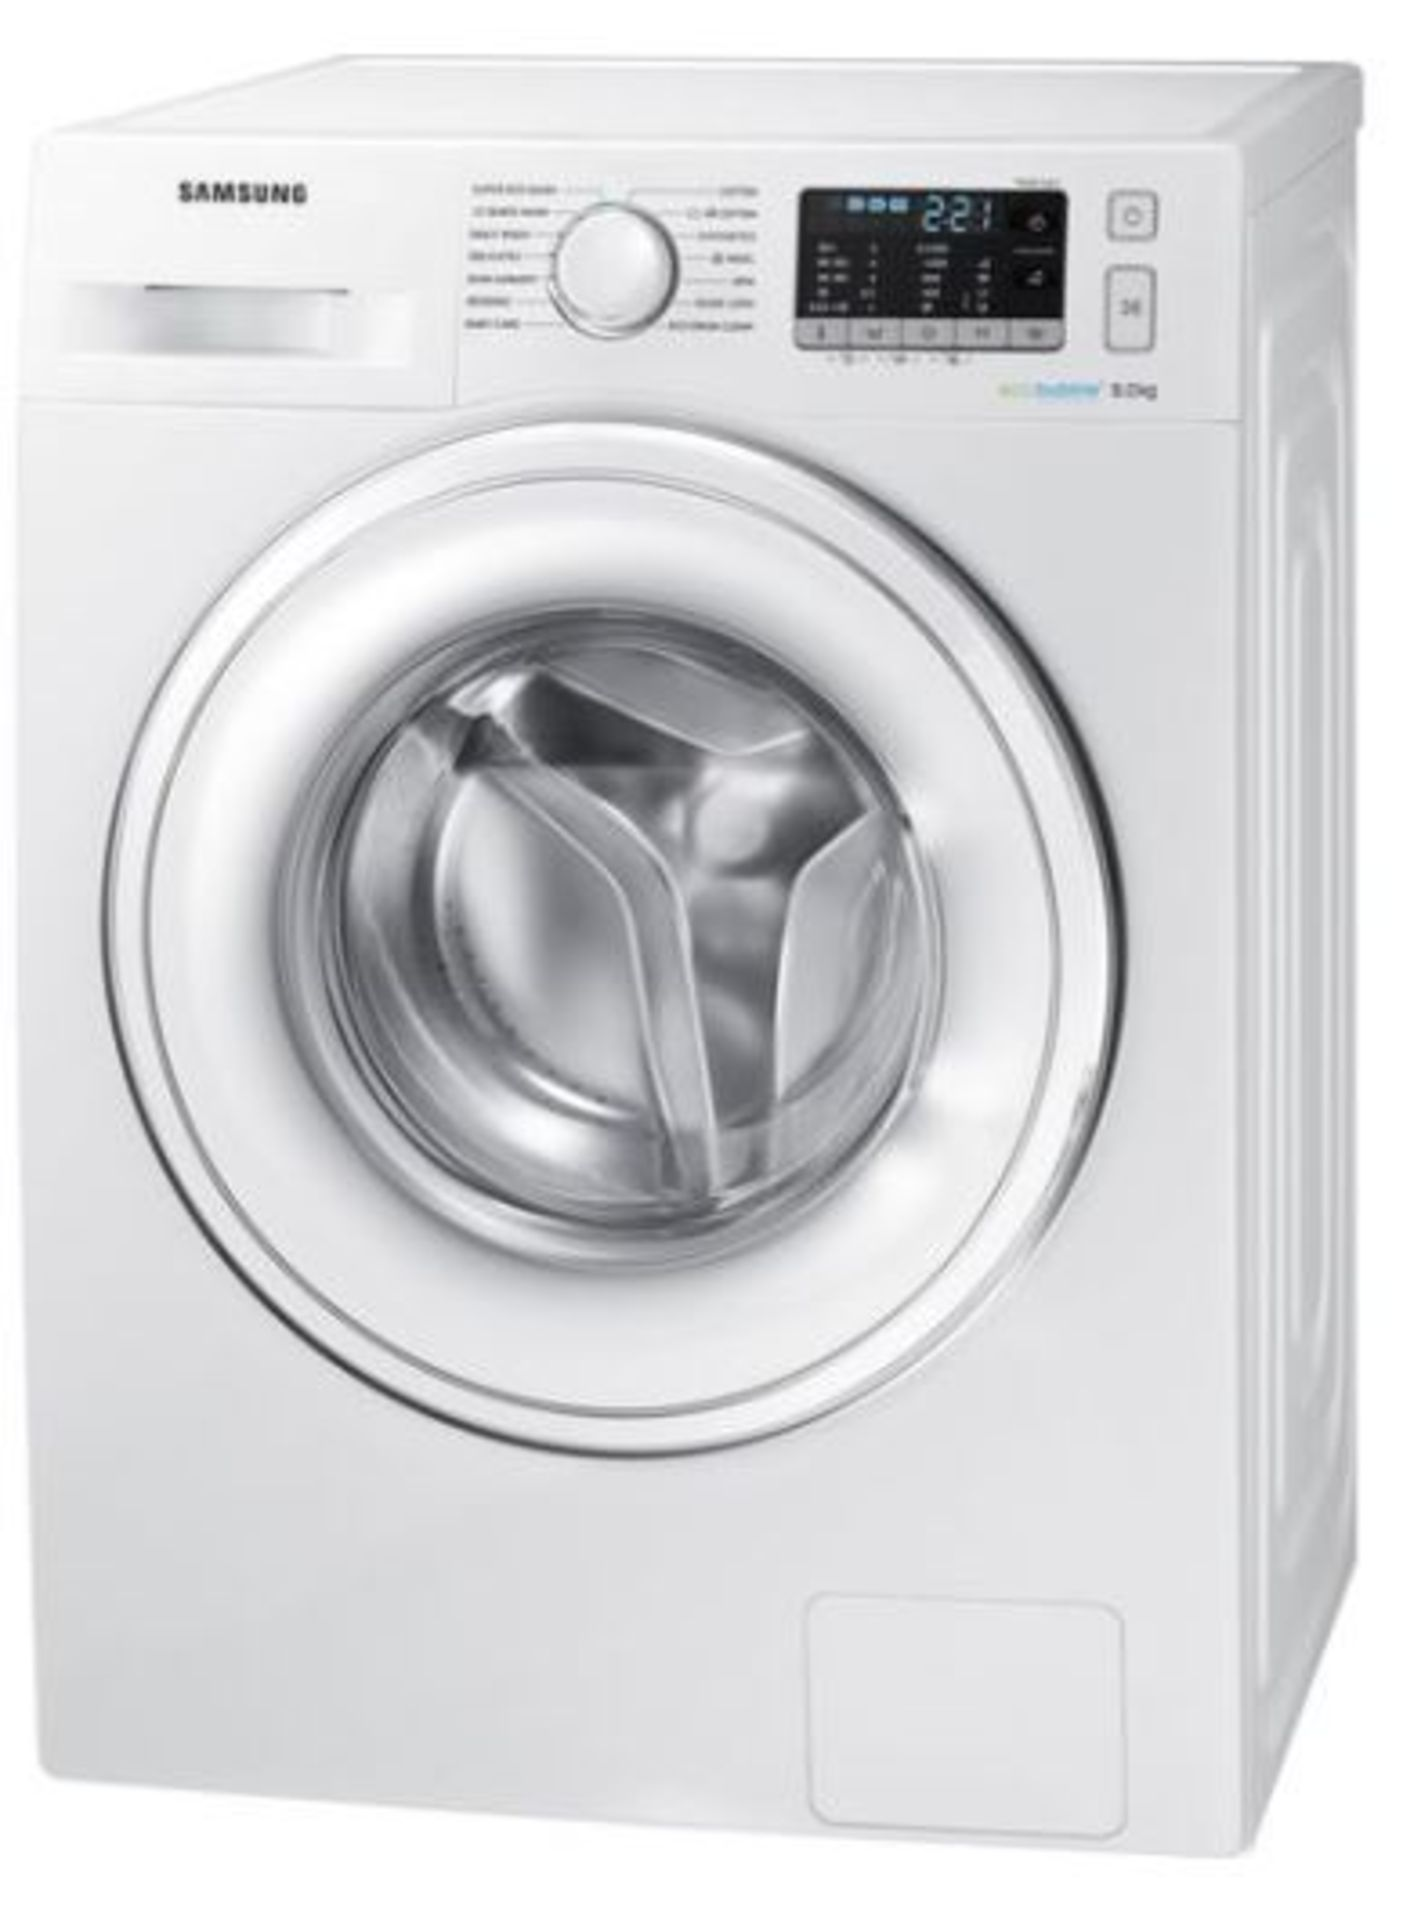 Pallet of 1 Samsung Premium Washing machine. Latest selling price £339*